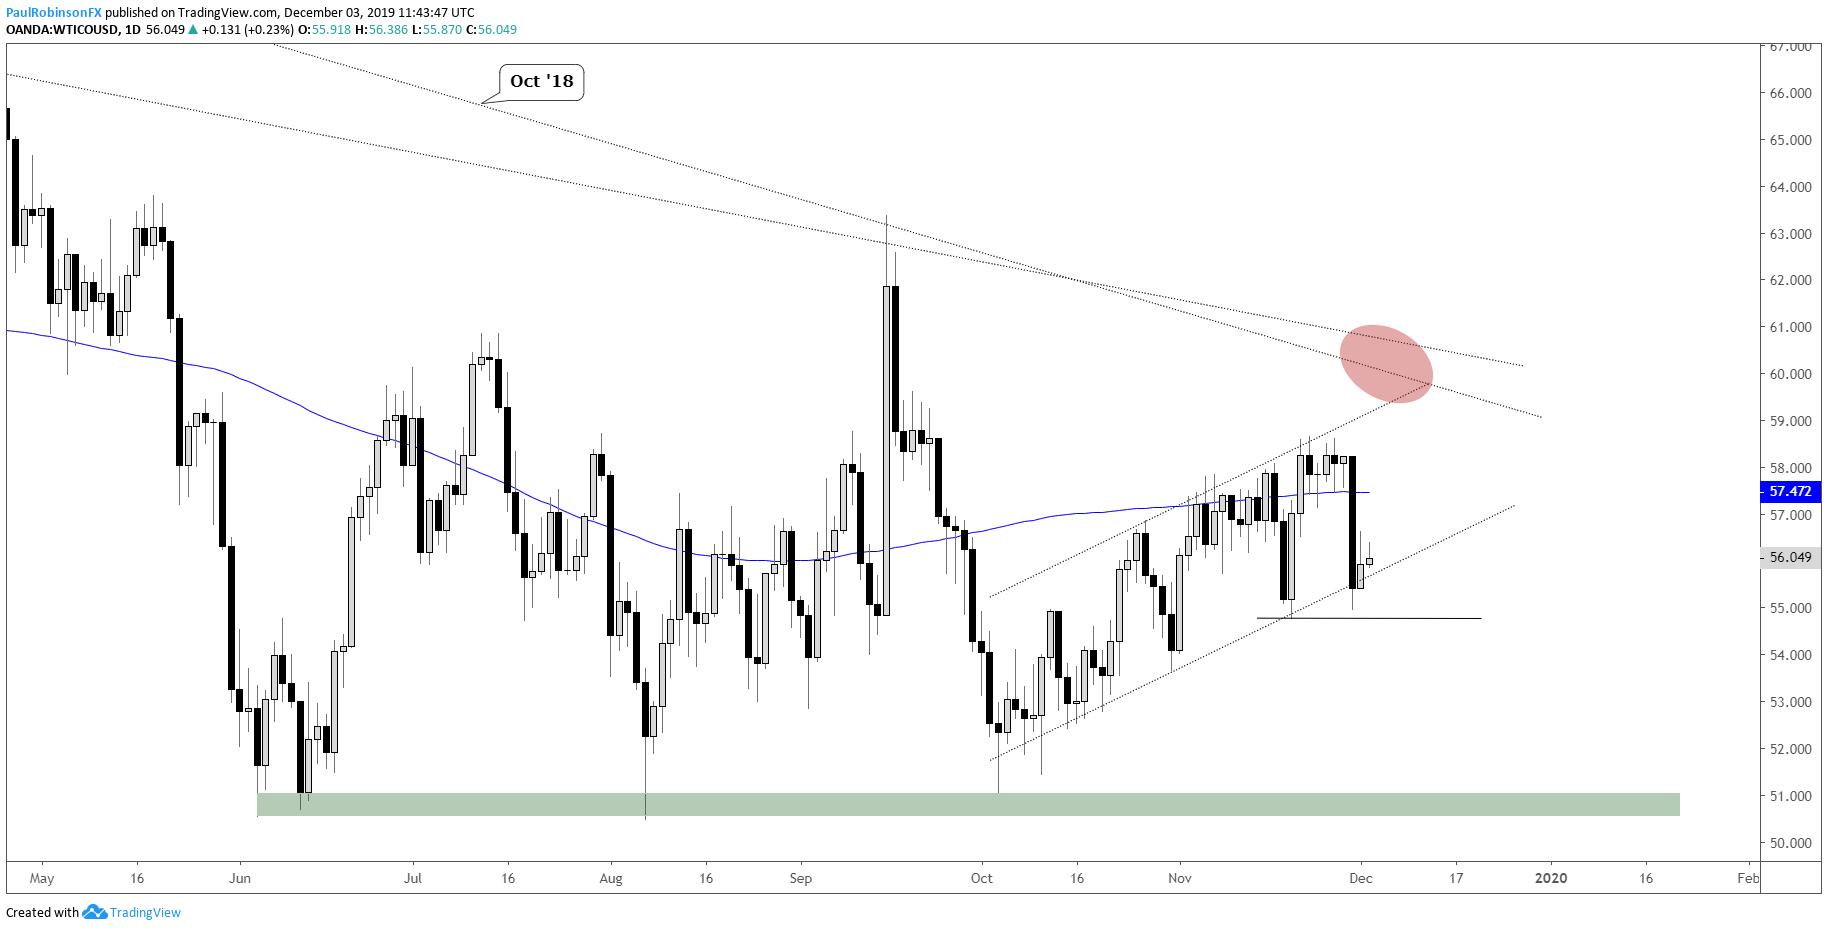 WTI原油和布蘭特原油價格:技術指標釋放相似信號,拋售在即